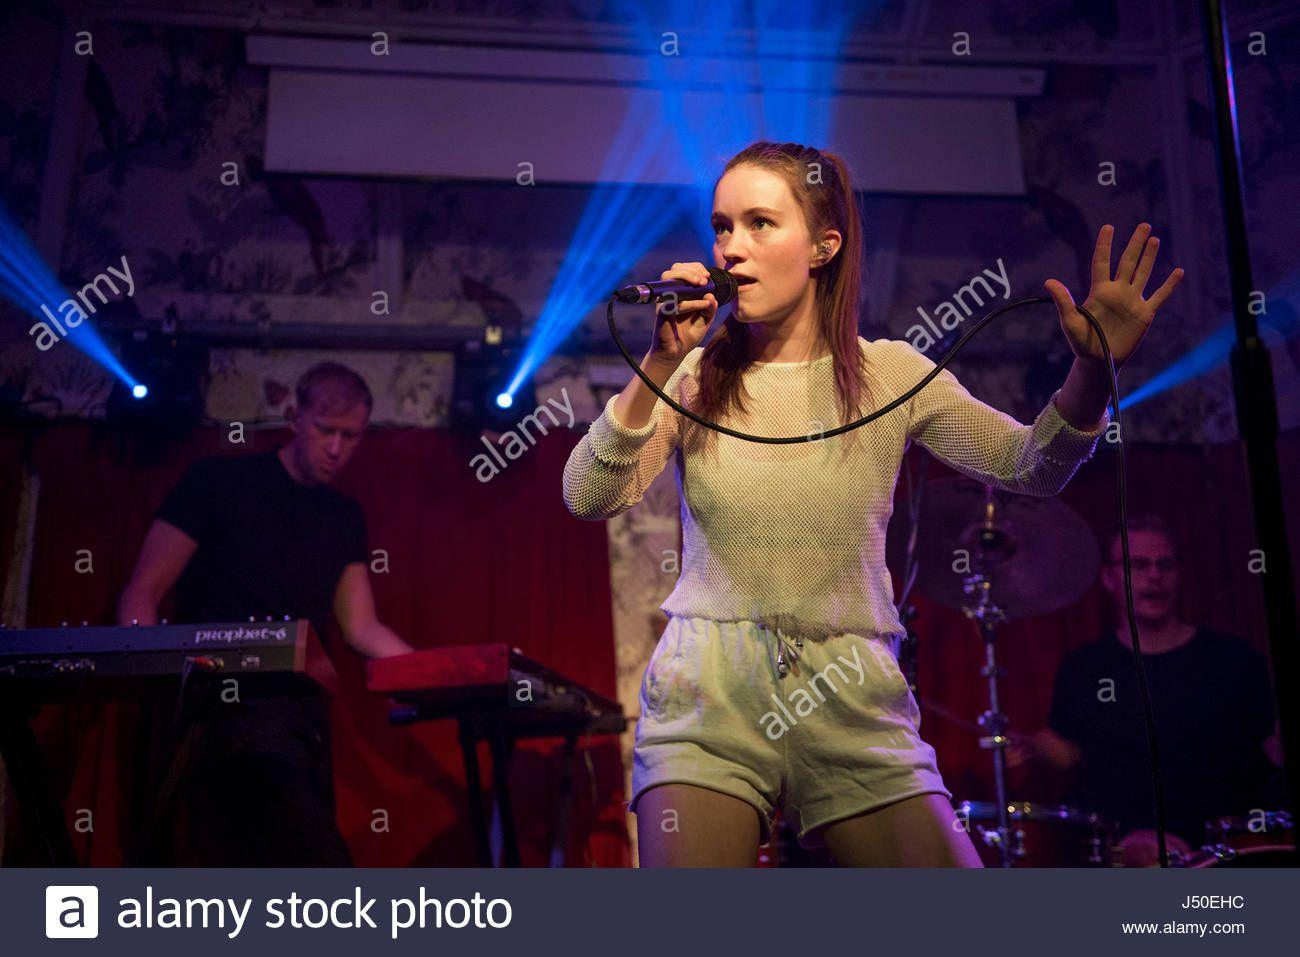 manchester-uk-15th-may-2017-norweigan-singer-songwriter-sigrid-solbakk-J50EHC.jpg